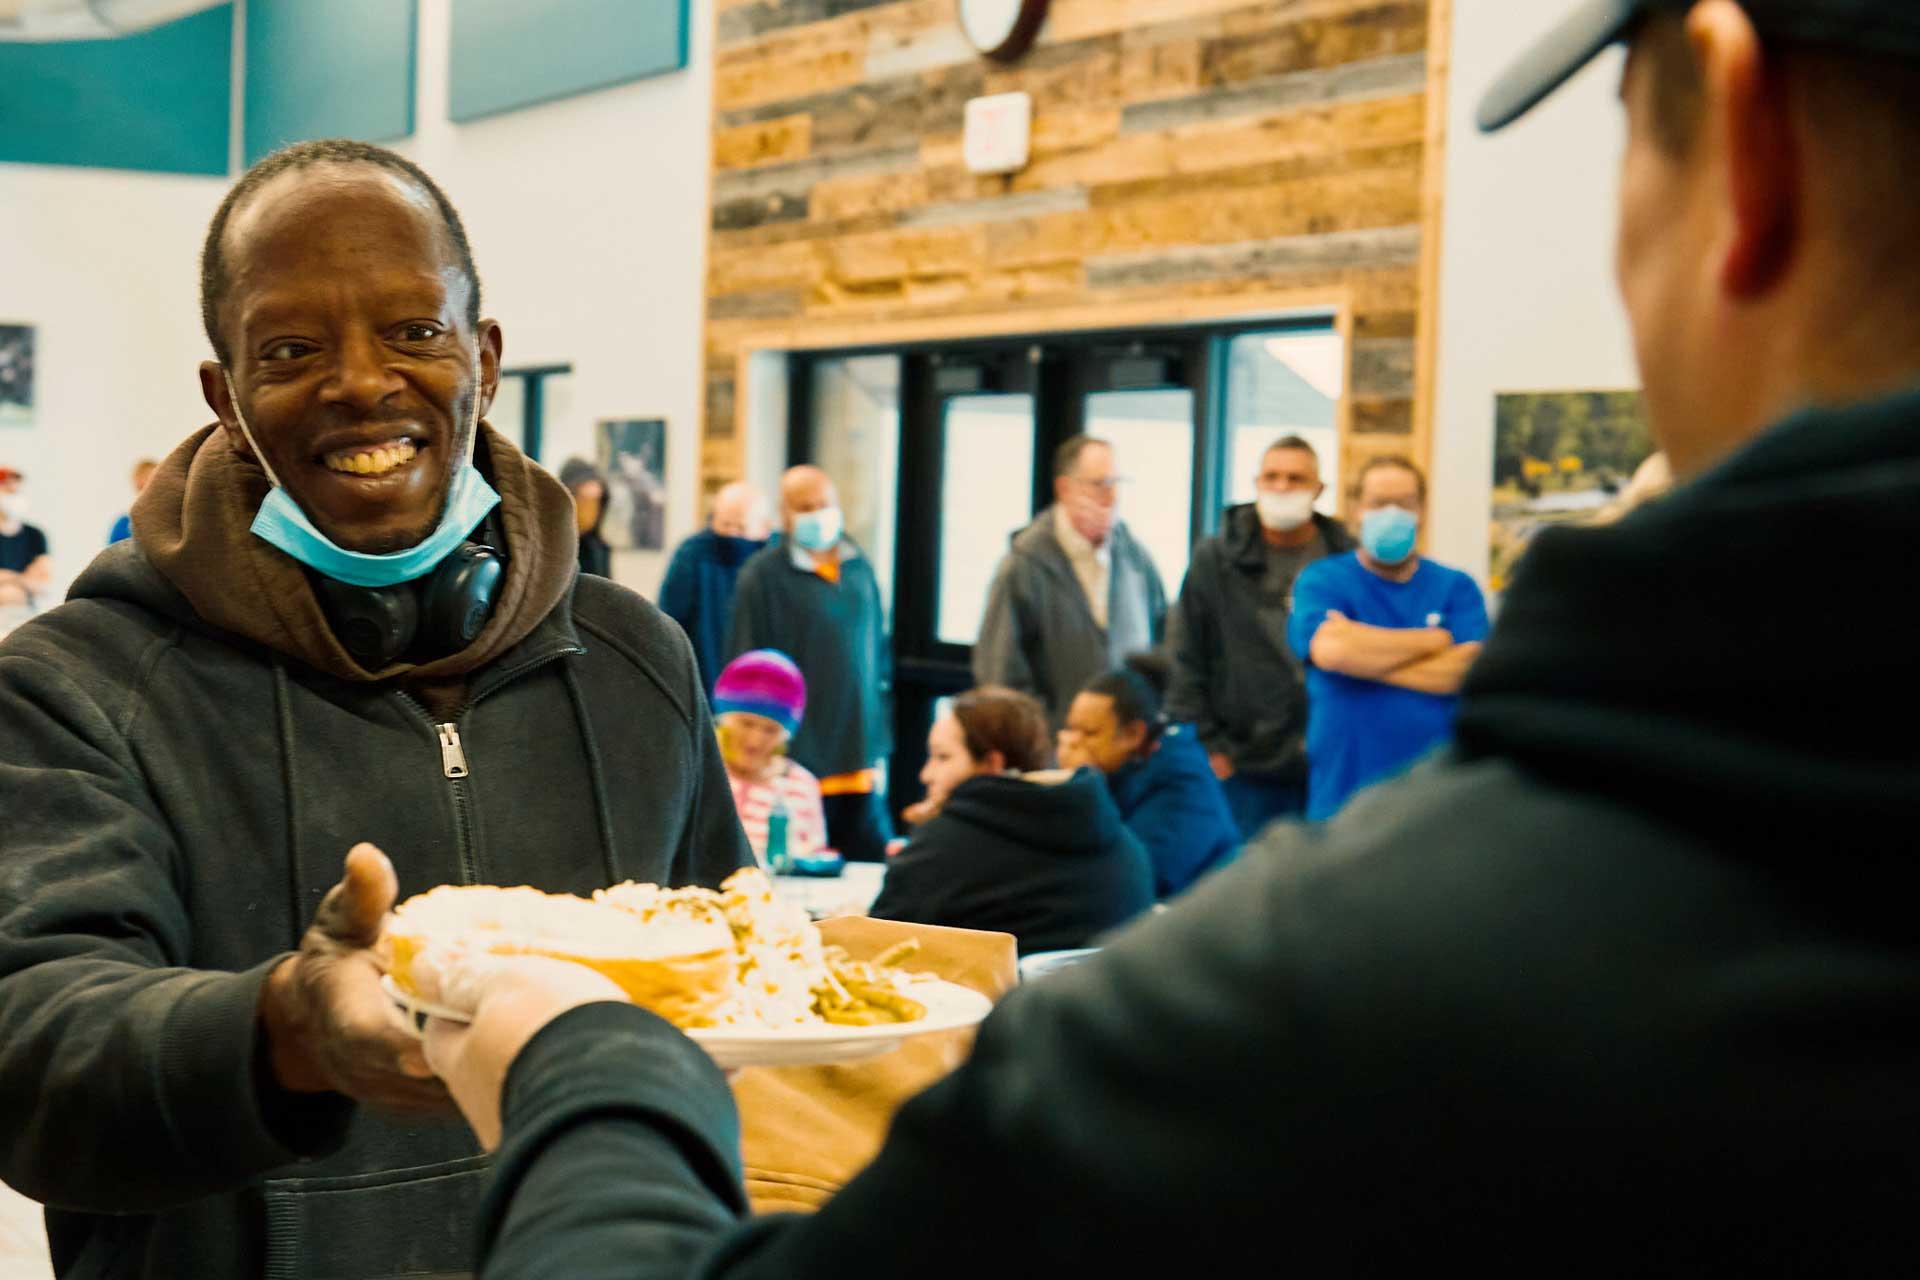 man receiving meal